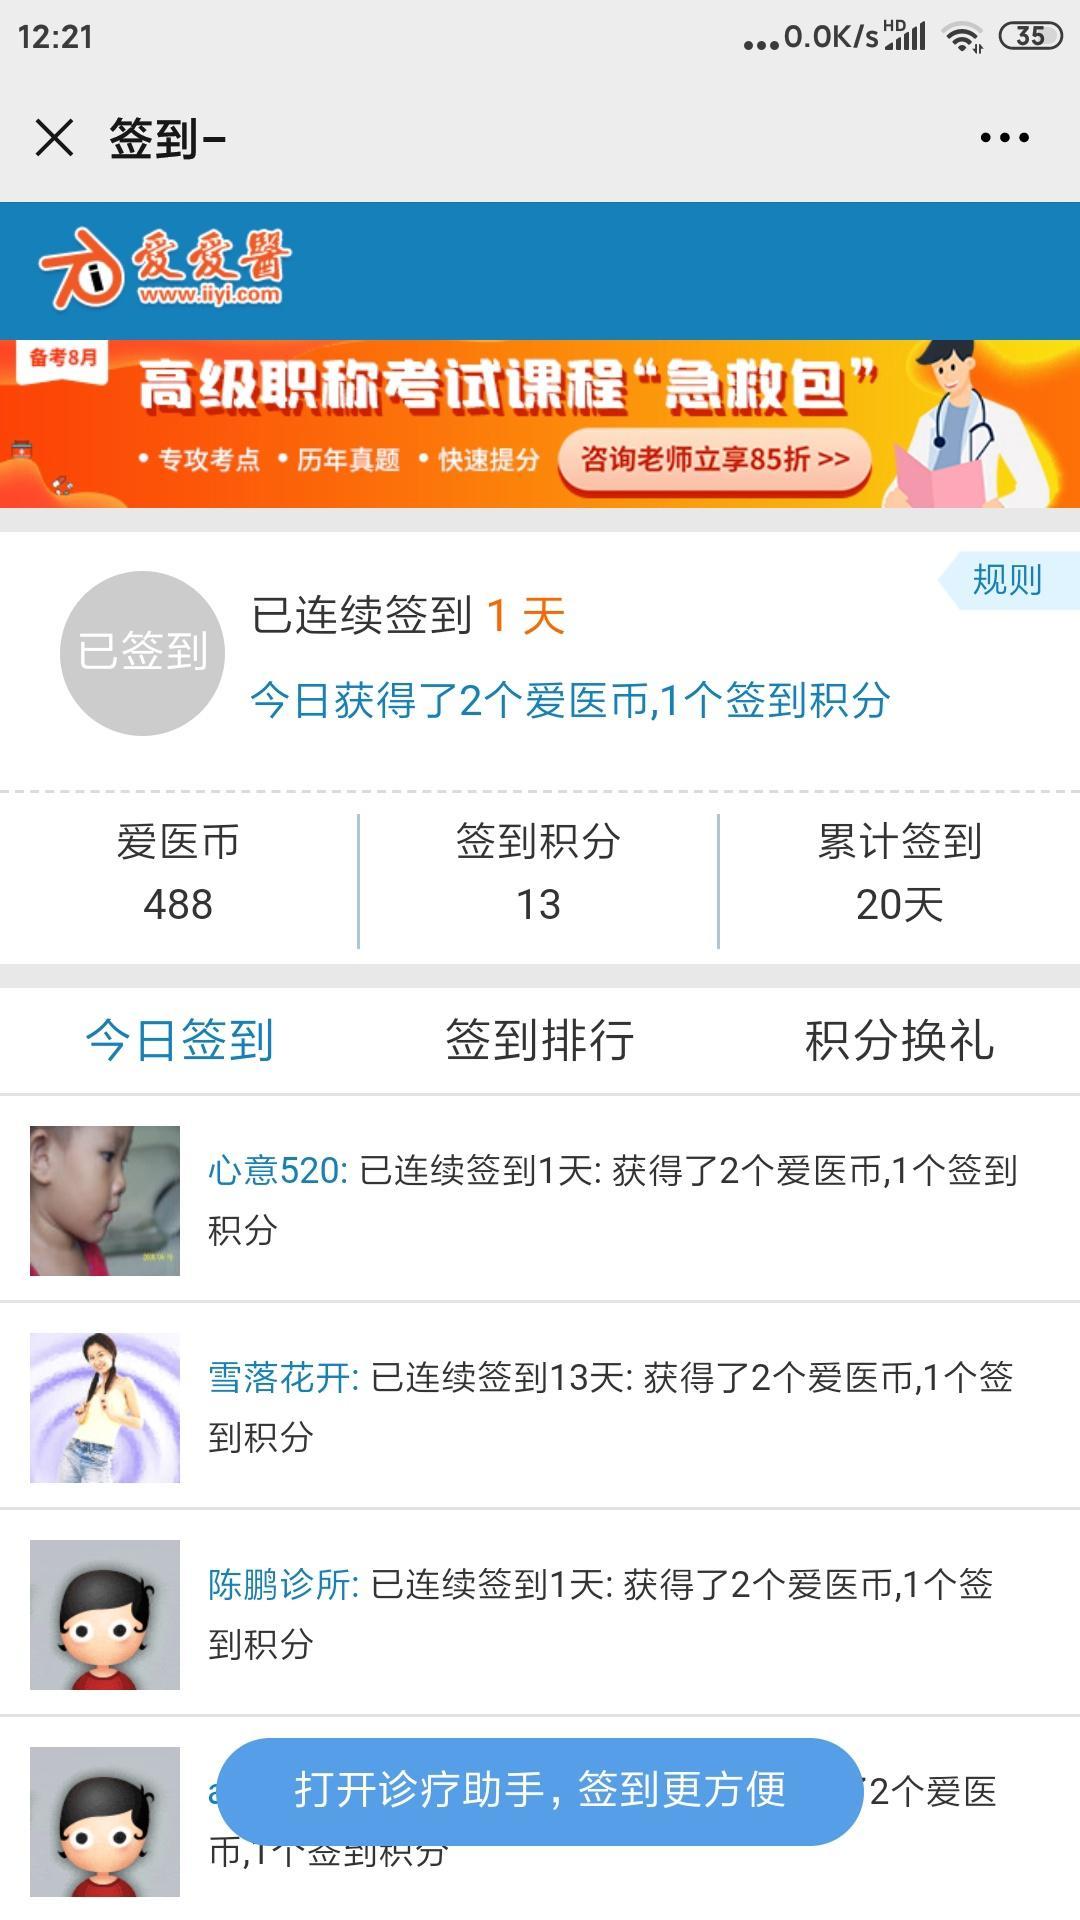 Screenshot_2020-07-09-12-21-42-572_com.tencent.mm.jpg